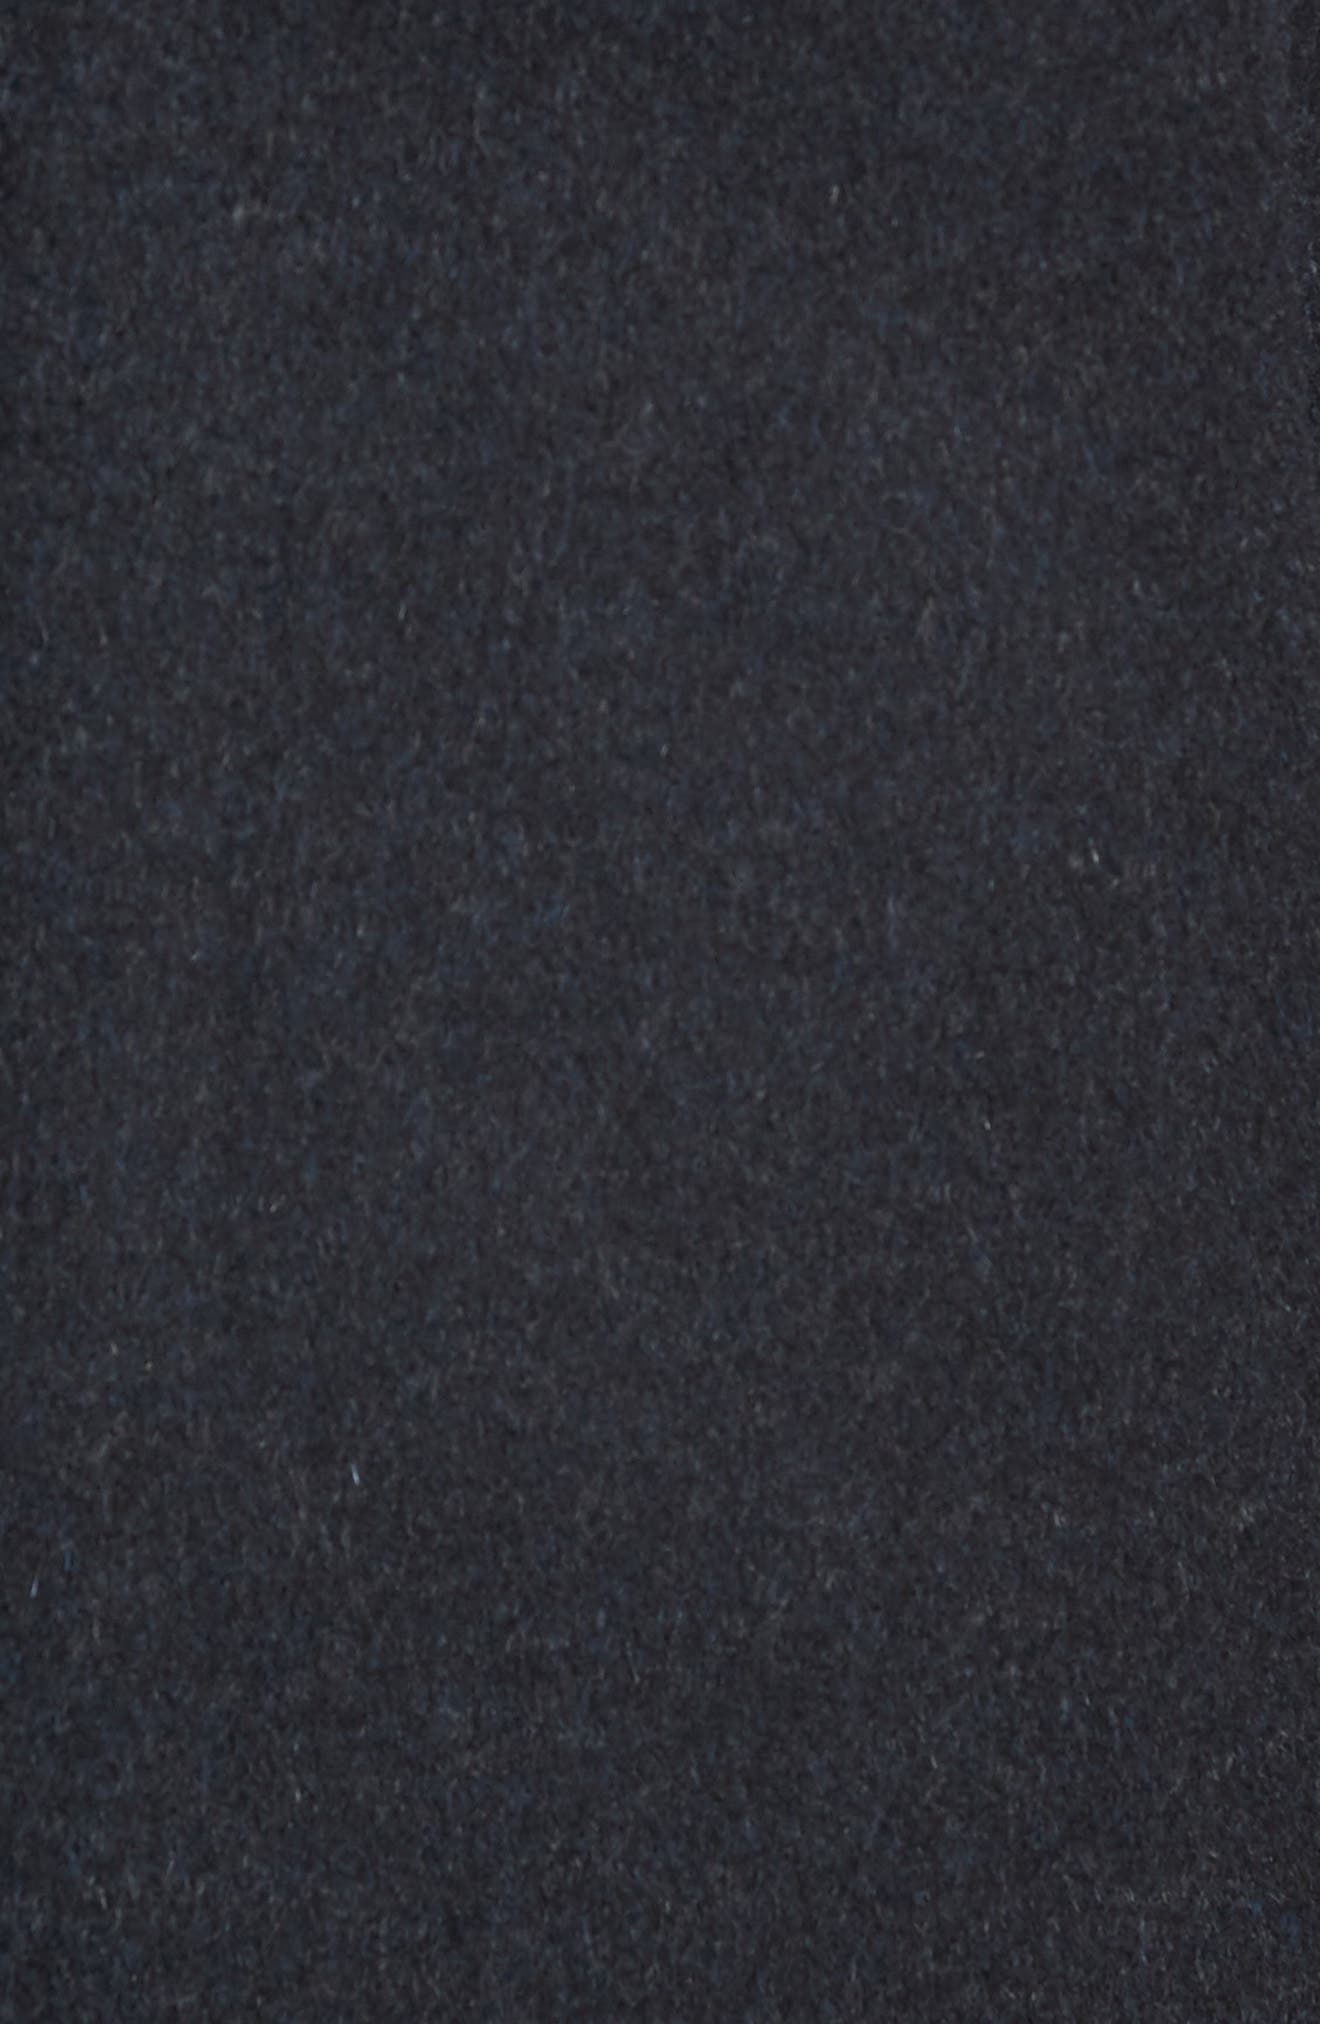 Hudson Wool Car Coat,                             Alternate thumbnail 6, color,                             NAVY MELANGE